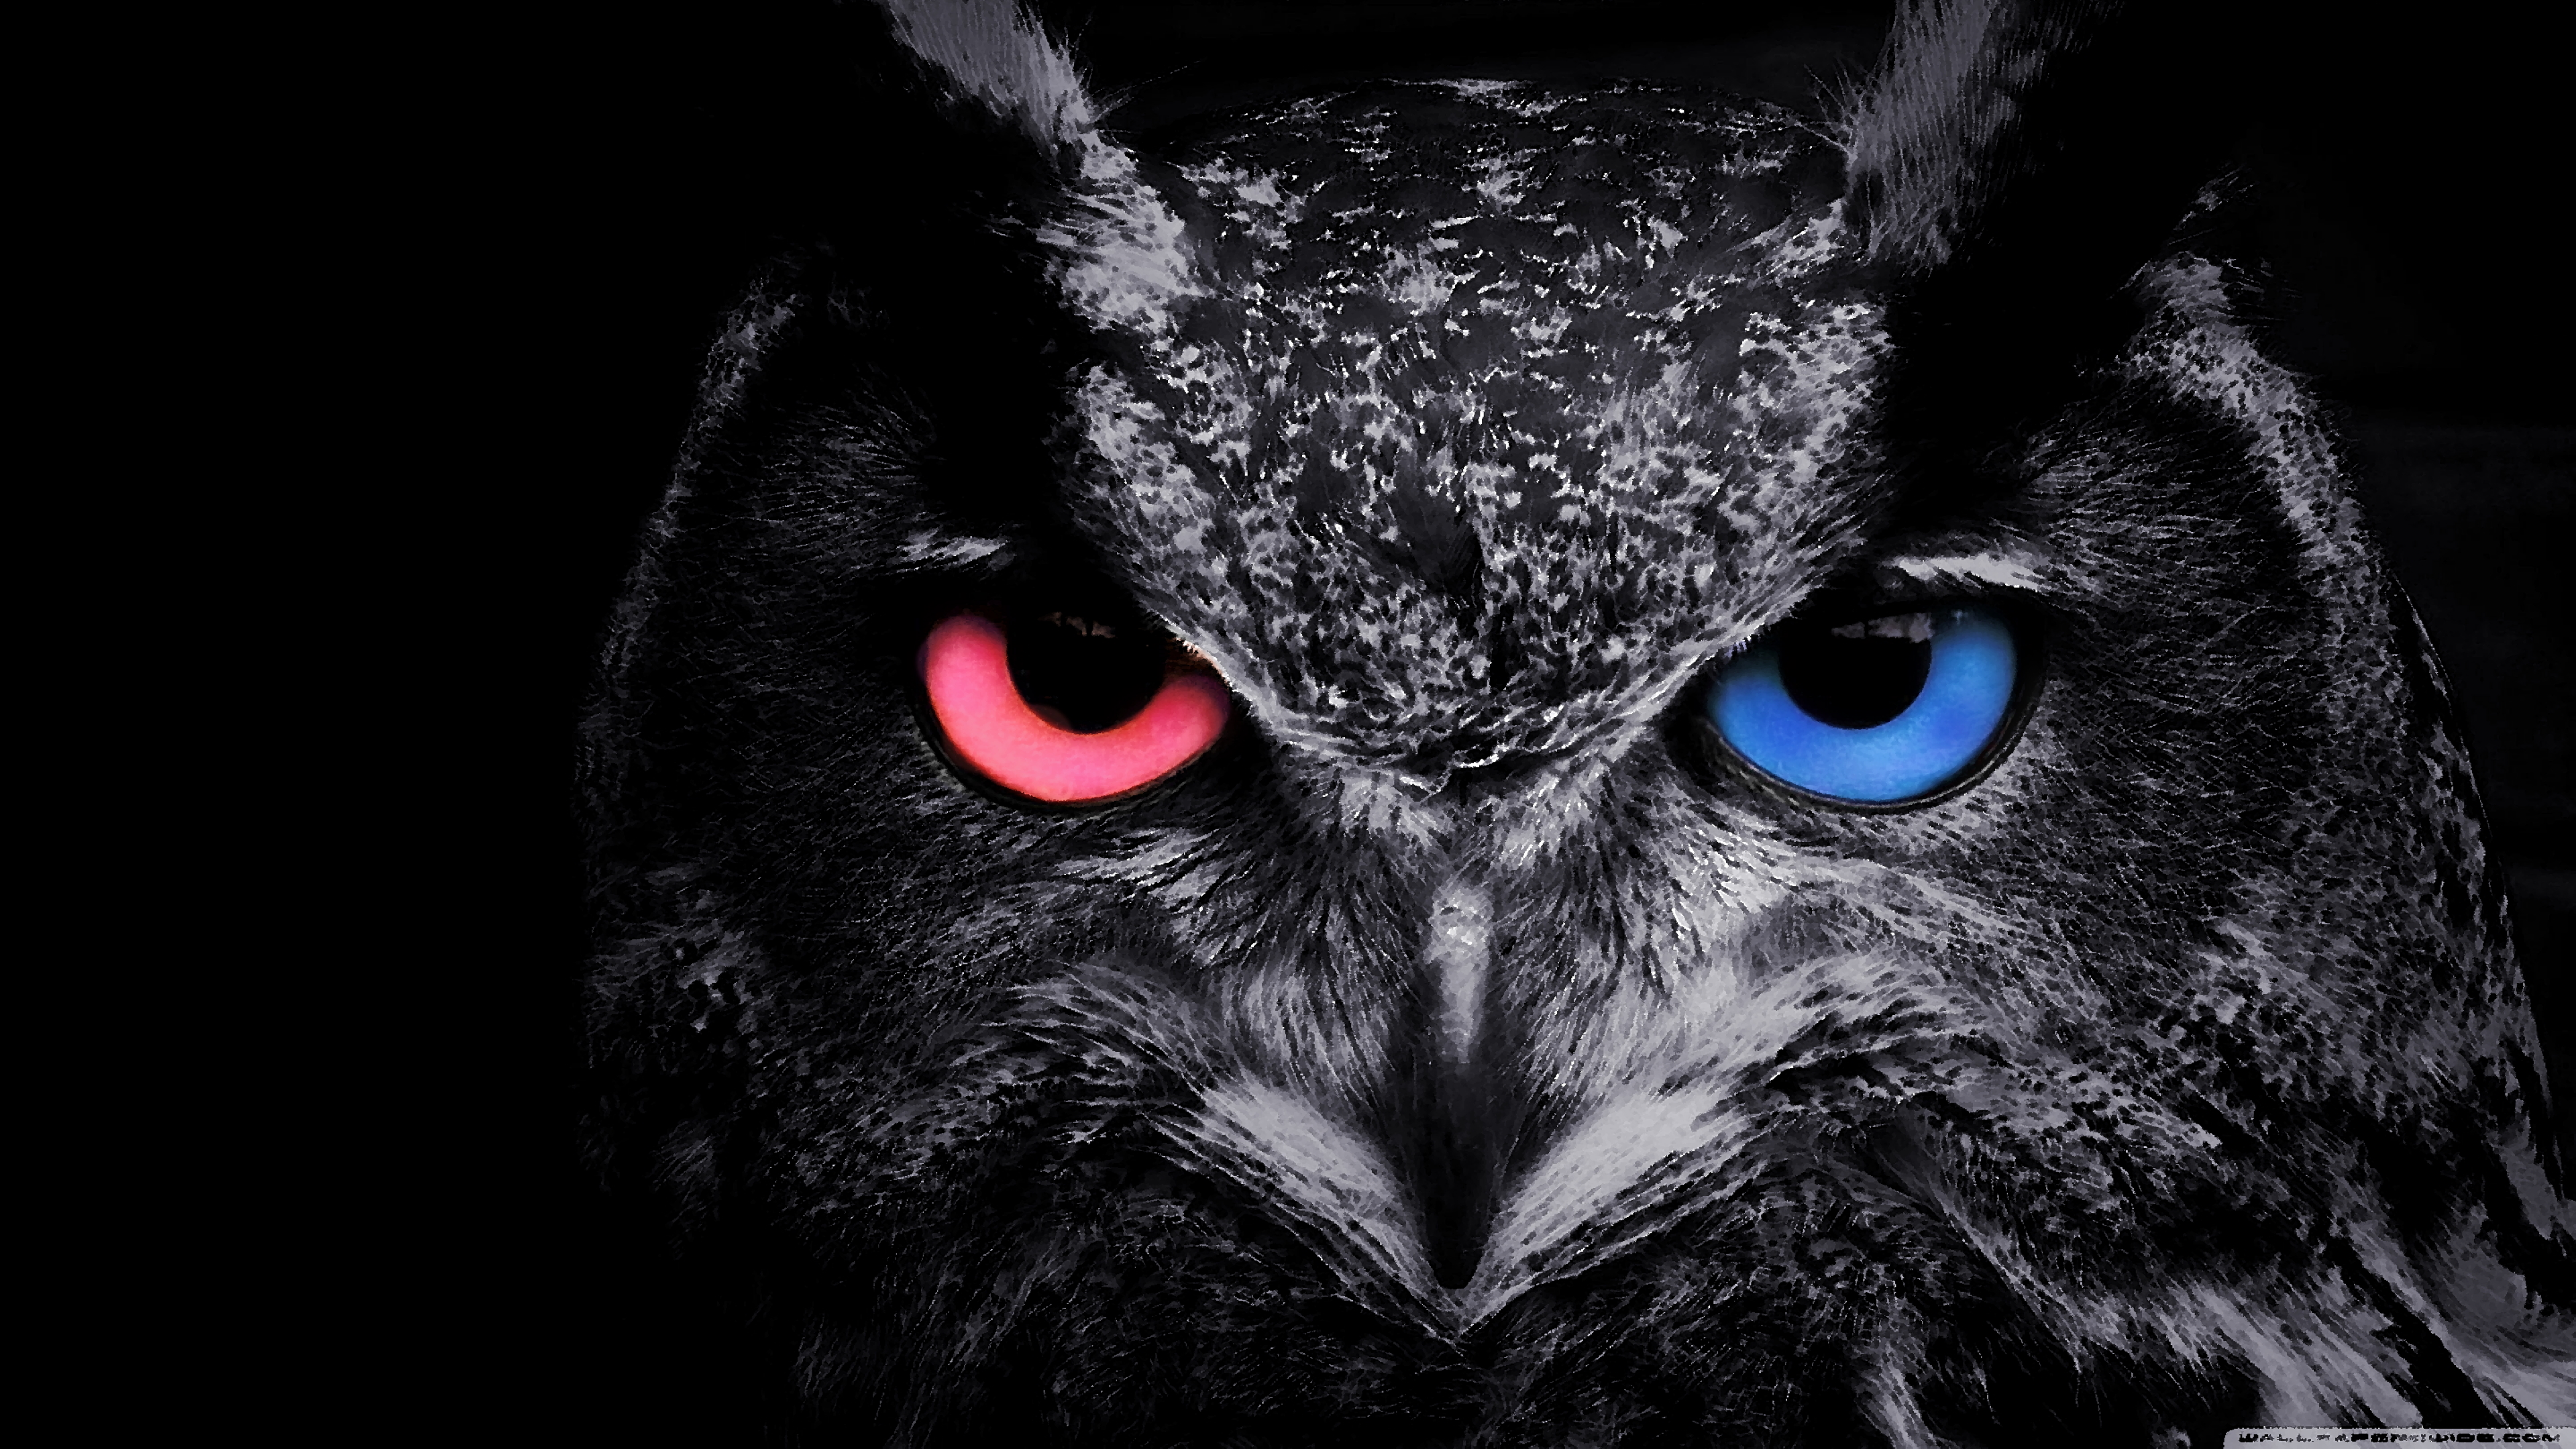 Pin By Bogdan Teodoru On Desktop Wallpapers Owl Wallpaper Owl Background Owl